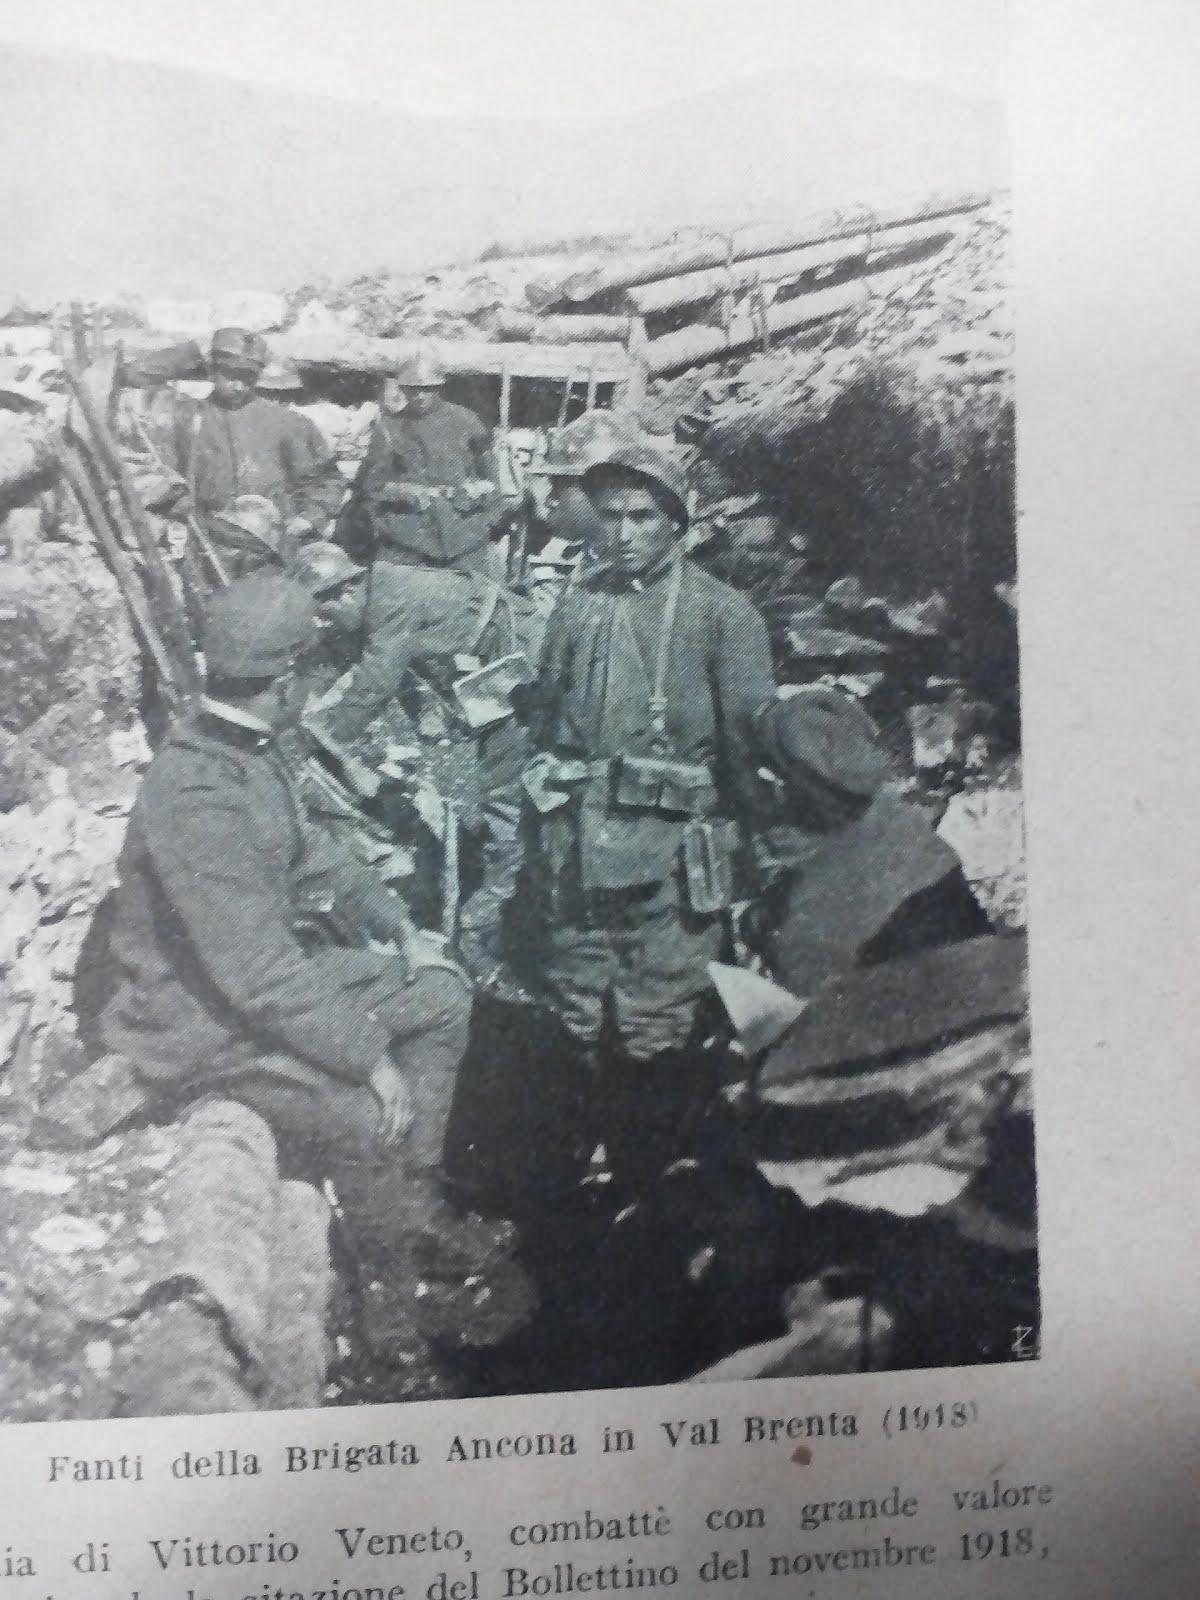 Brigata Ancona